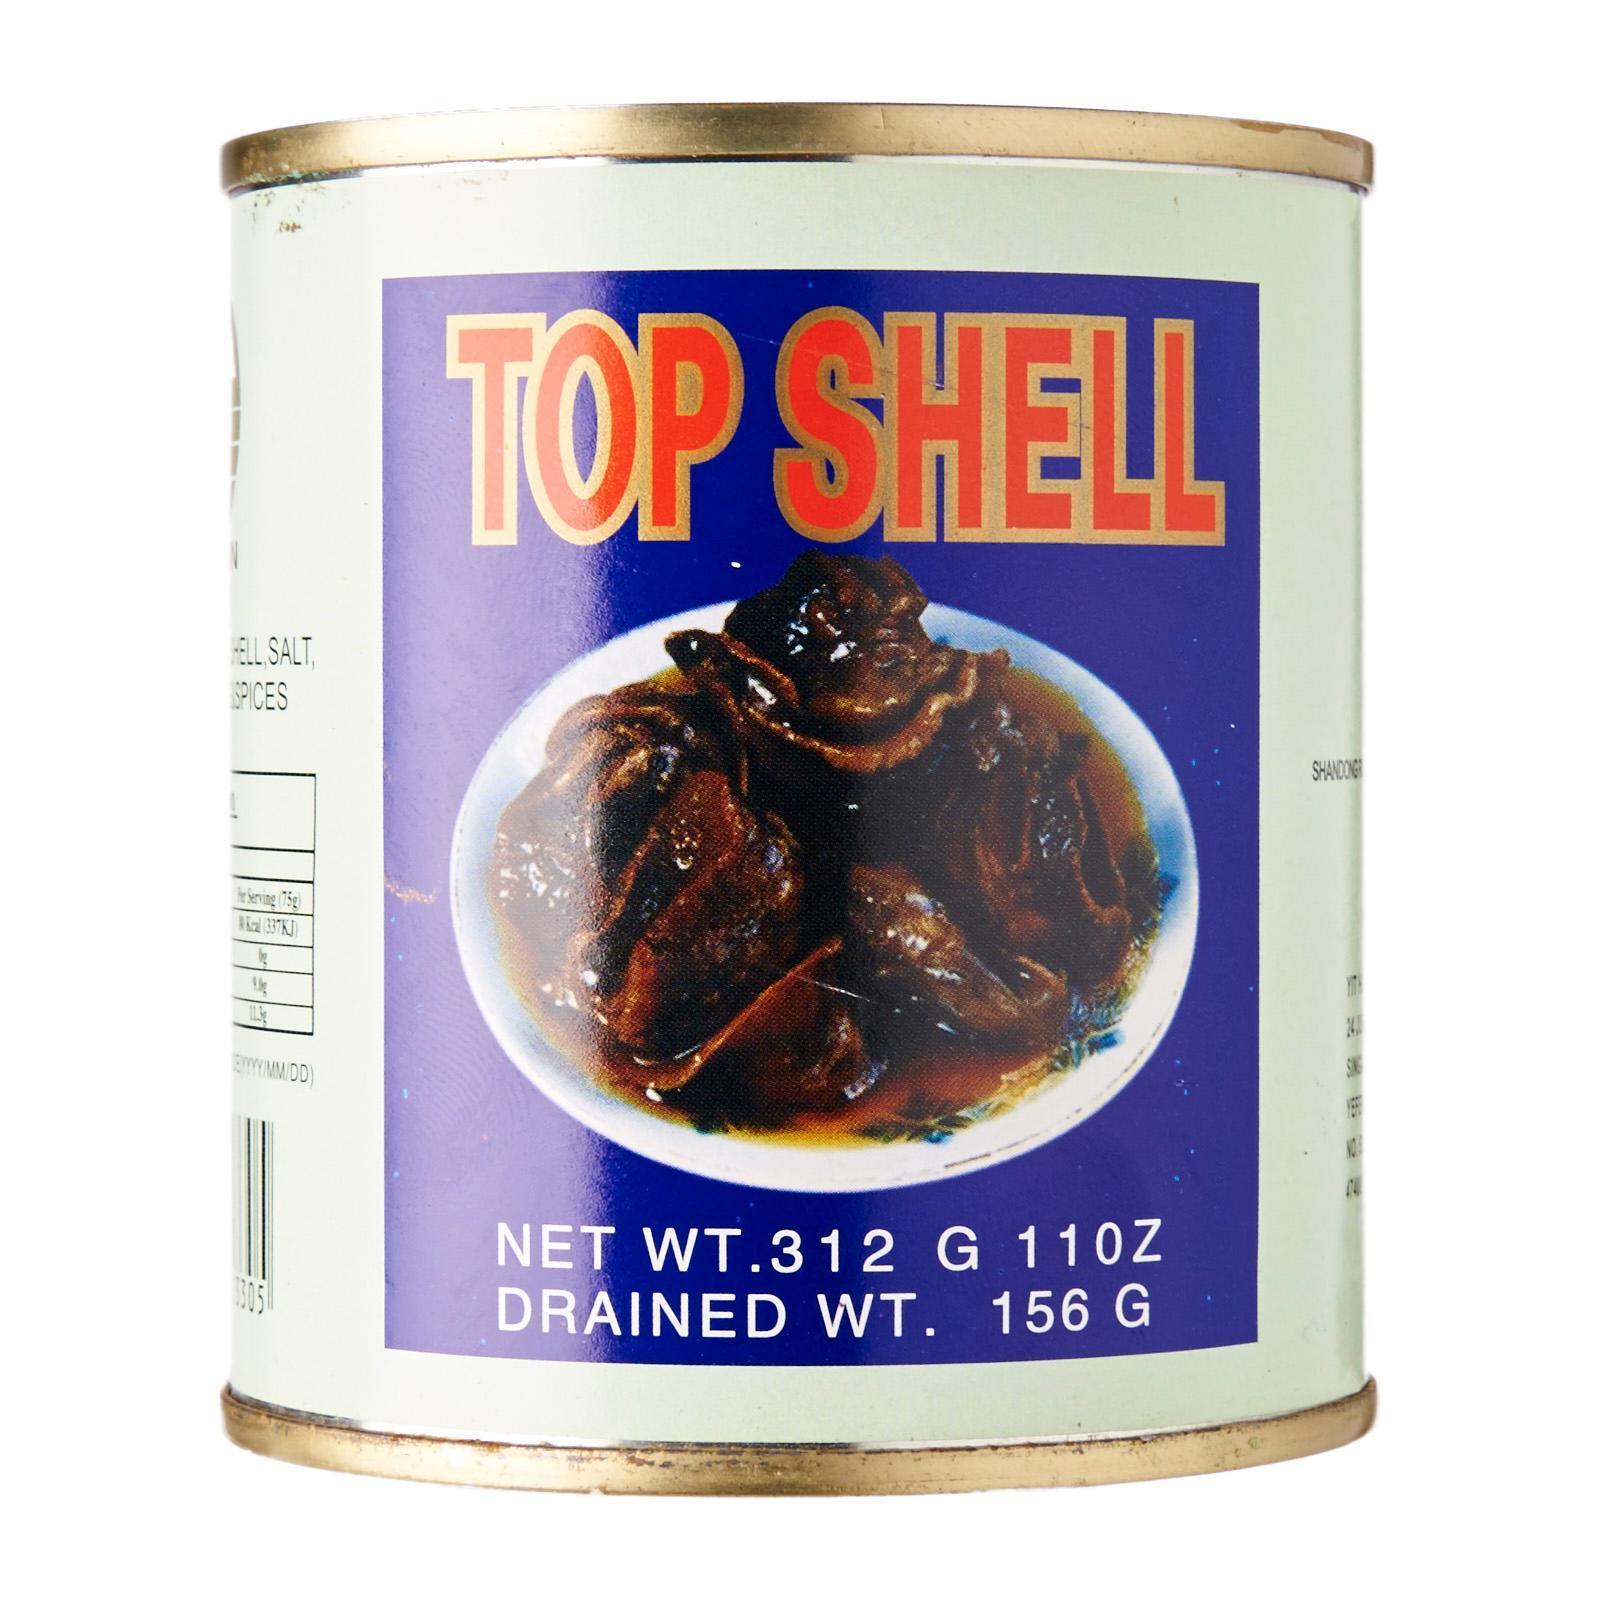 Yifon Top Shell By Redmart.